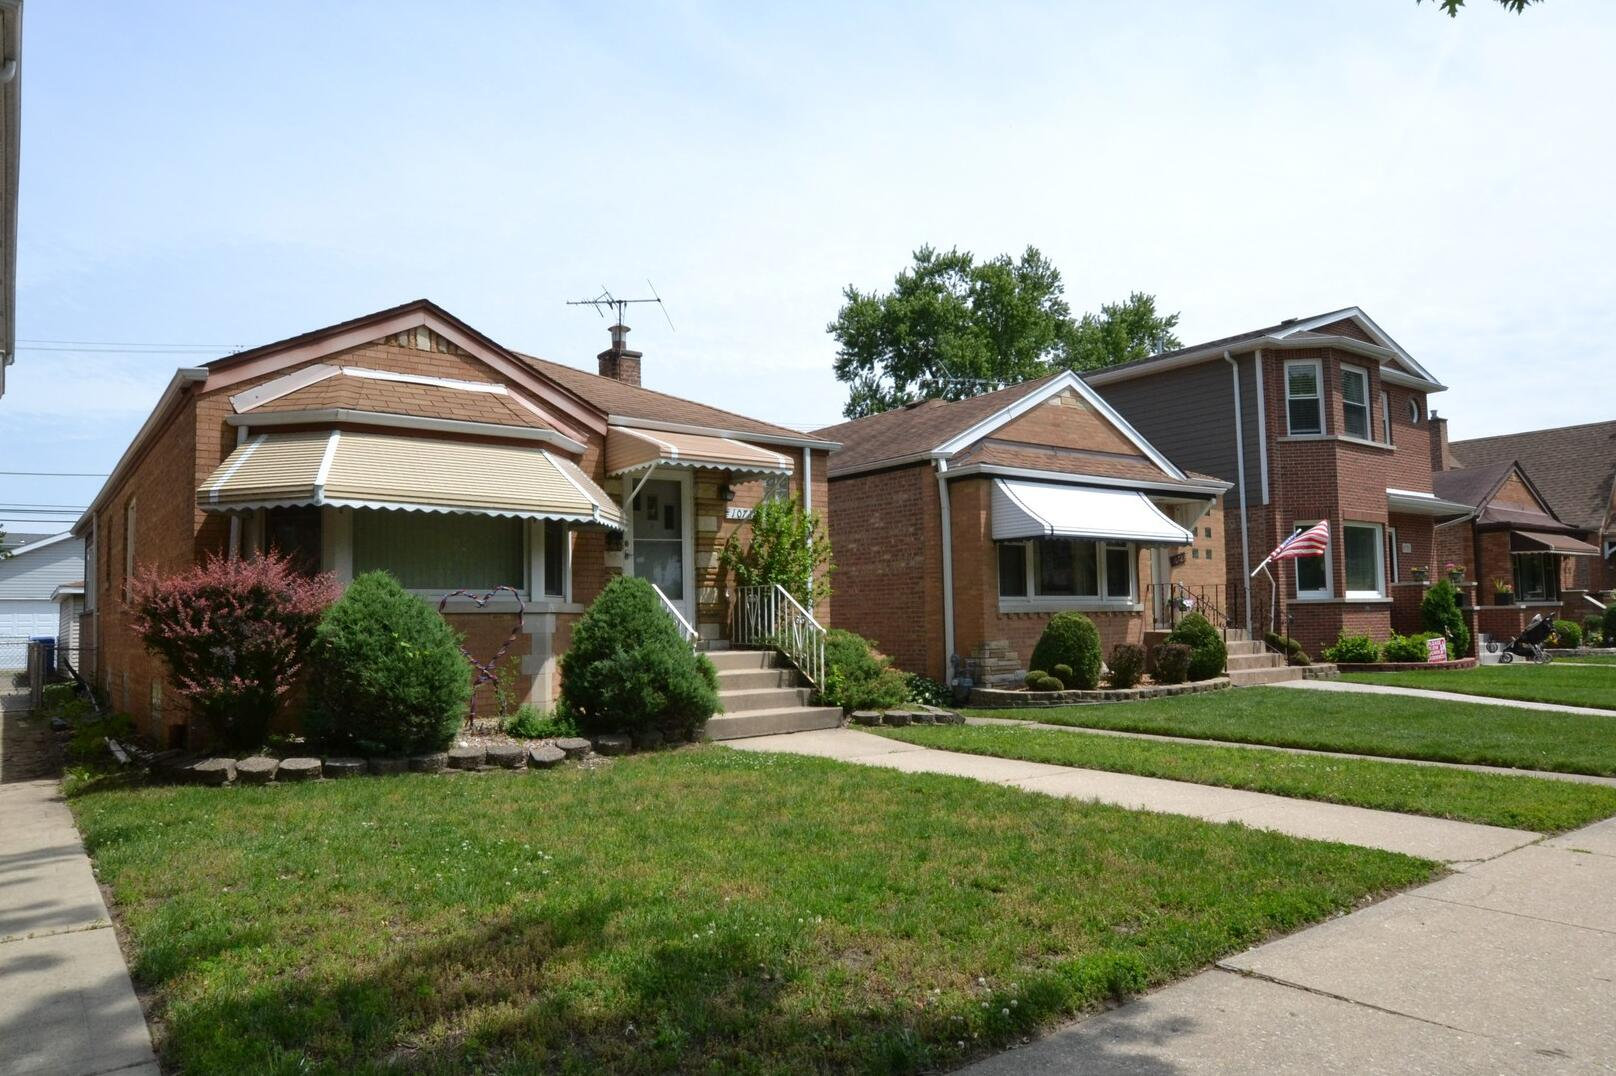 Photo of 10719 Sawyer Chicago IL 60655